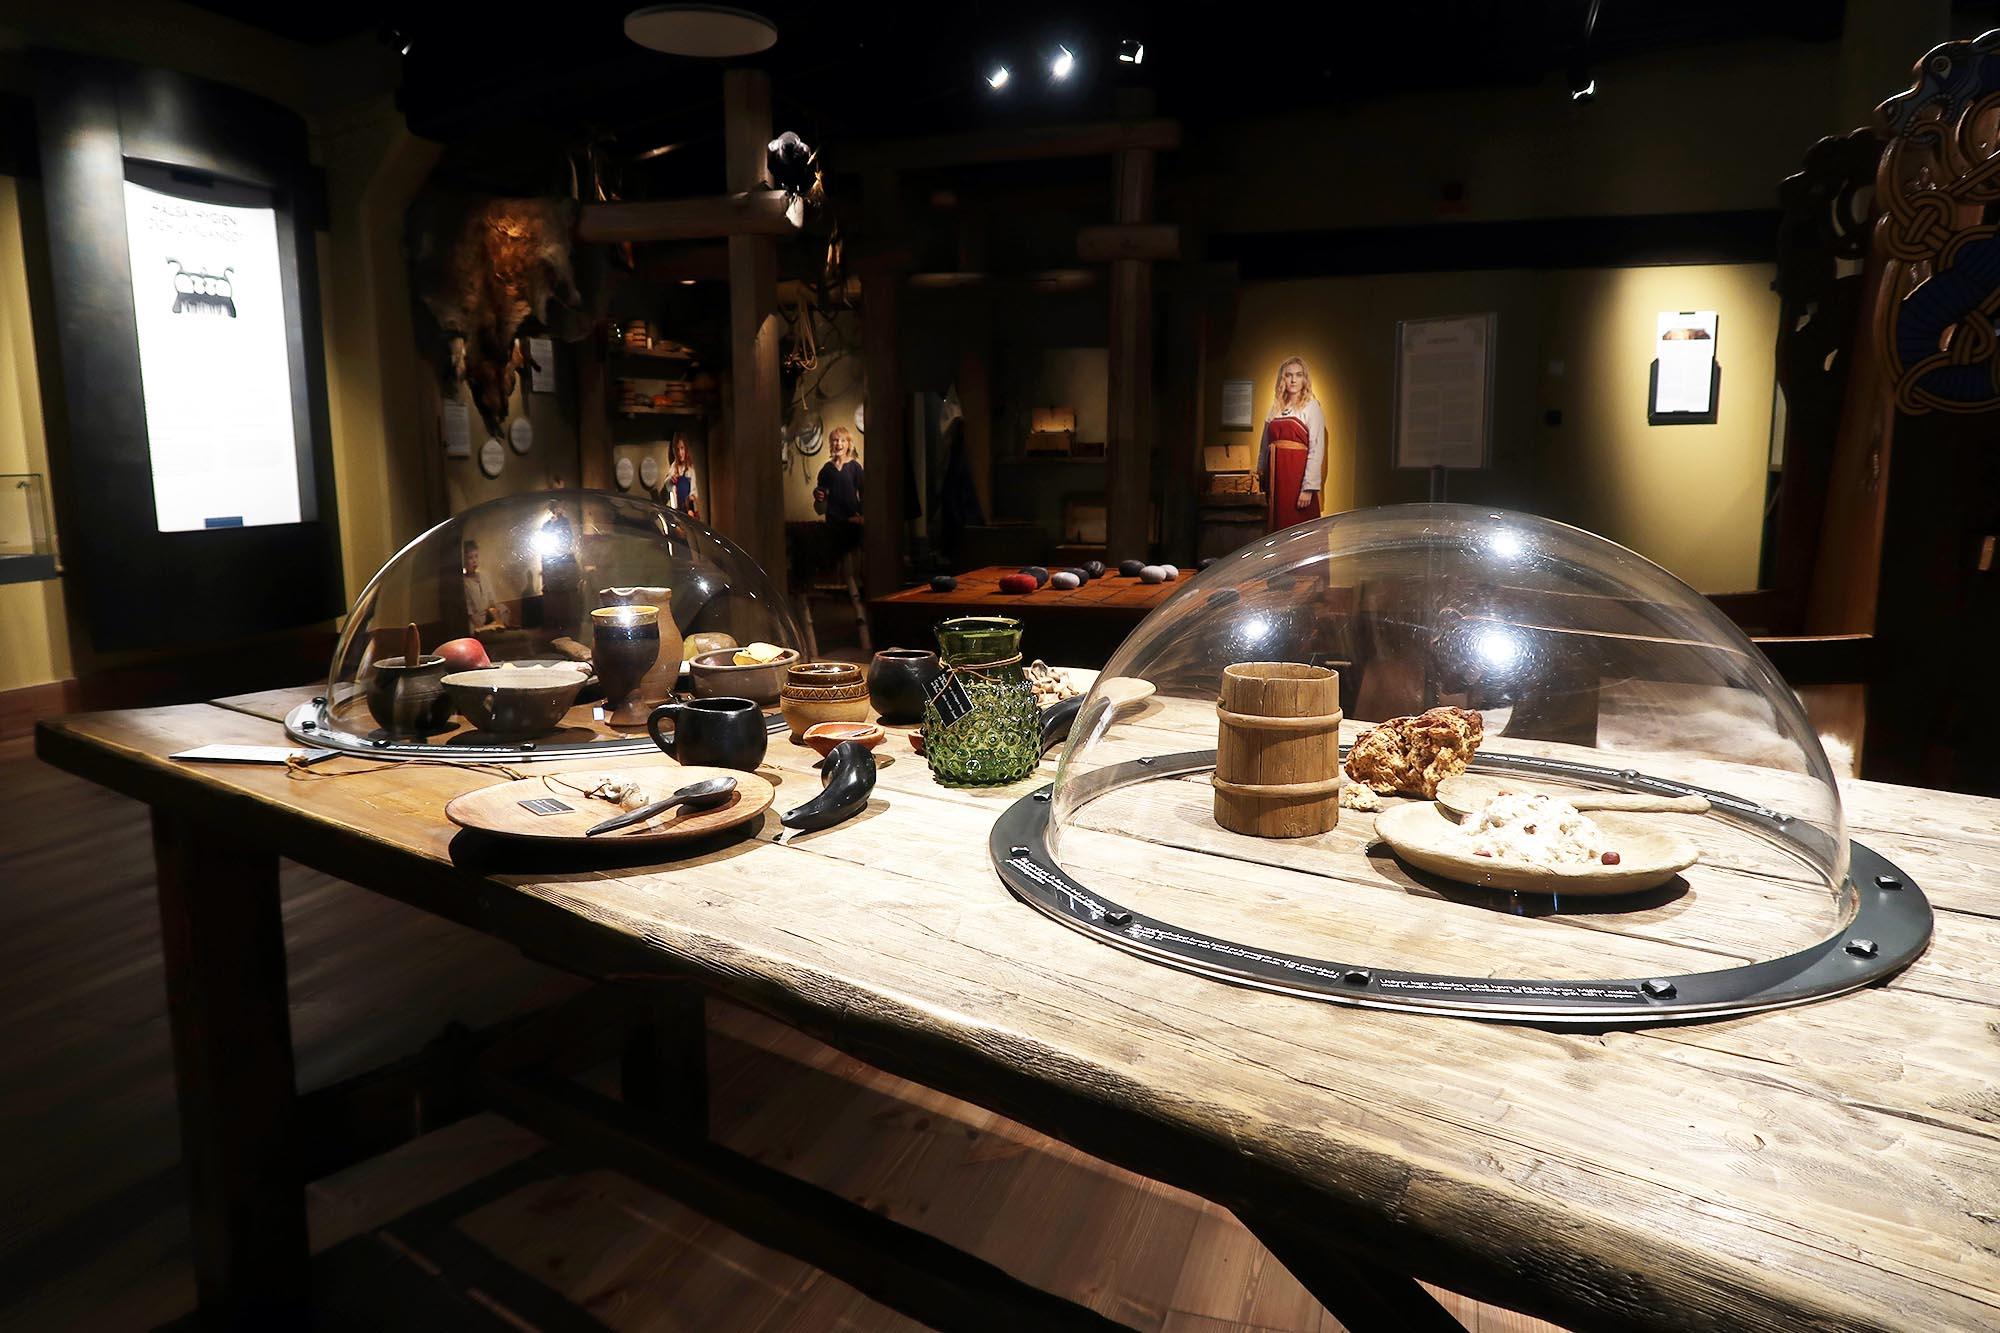 Vikingaliv - ett upplevelsemuseum